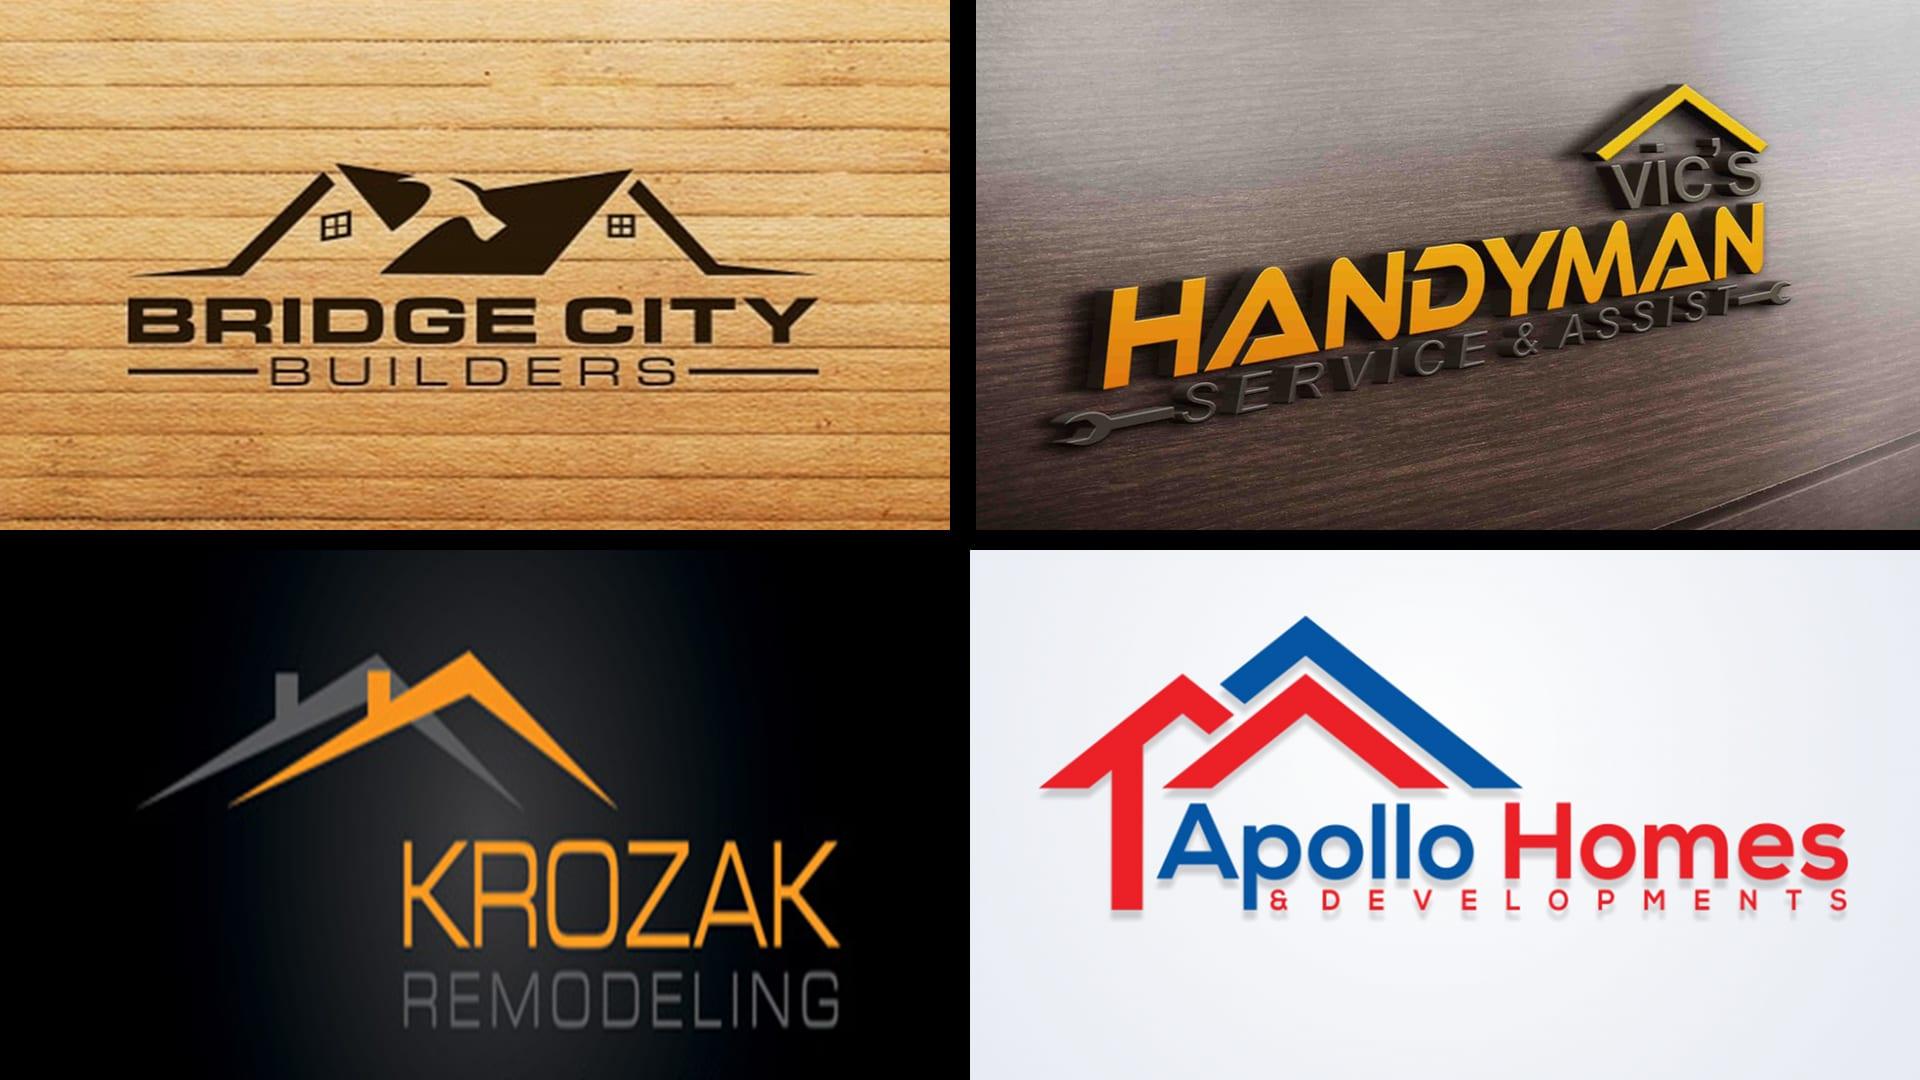 Design elegant home renovation decor and handyman logo by Moobadesigns